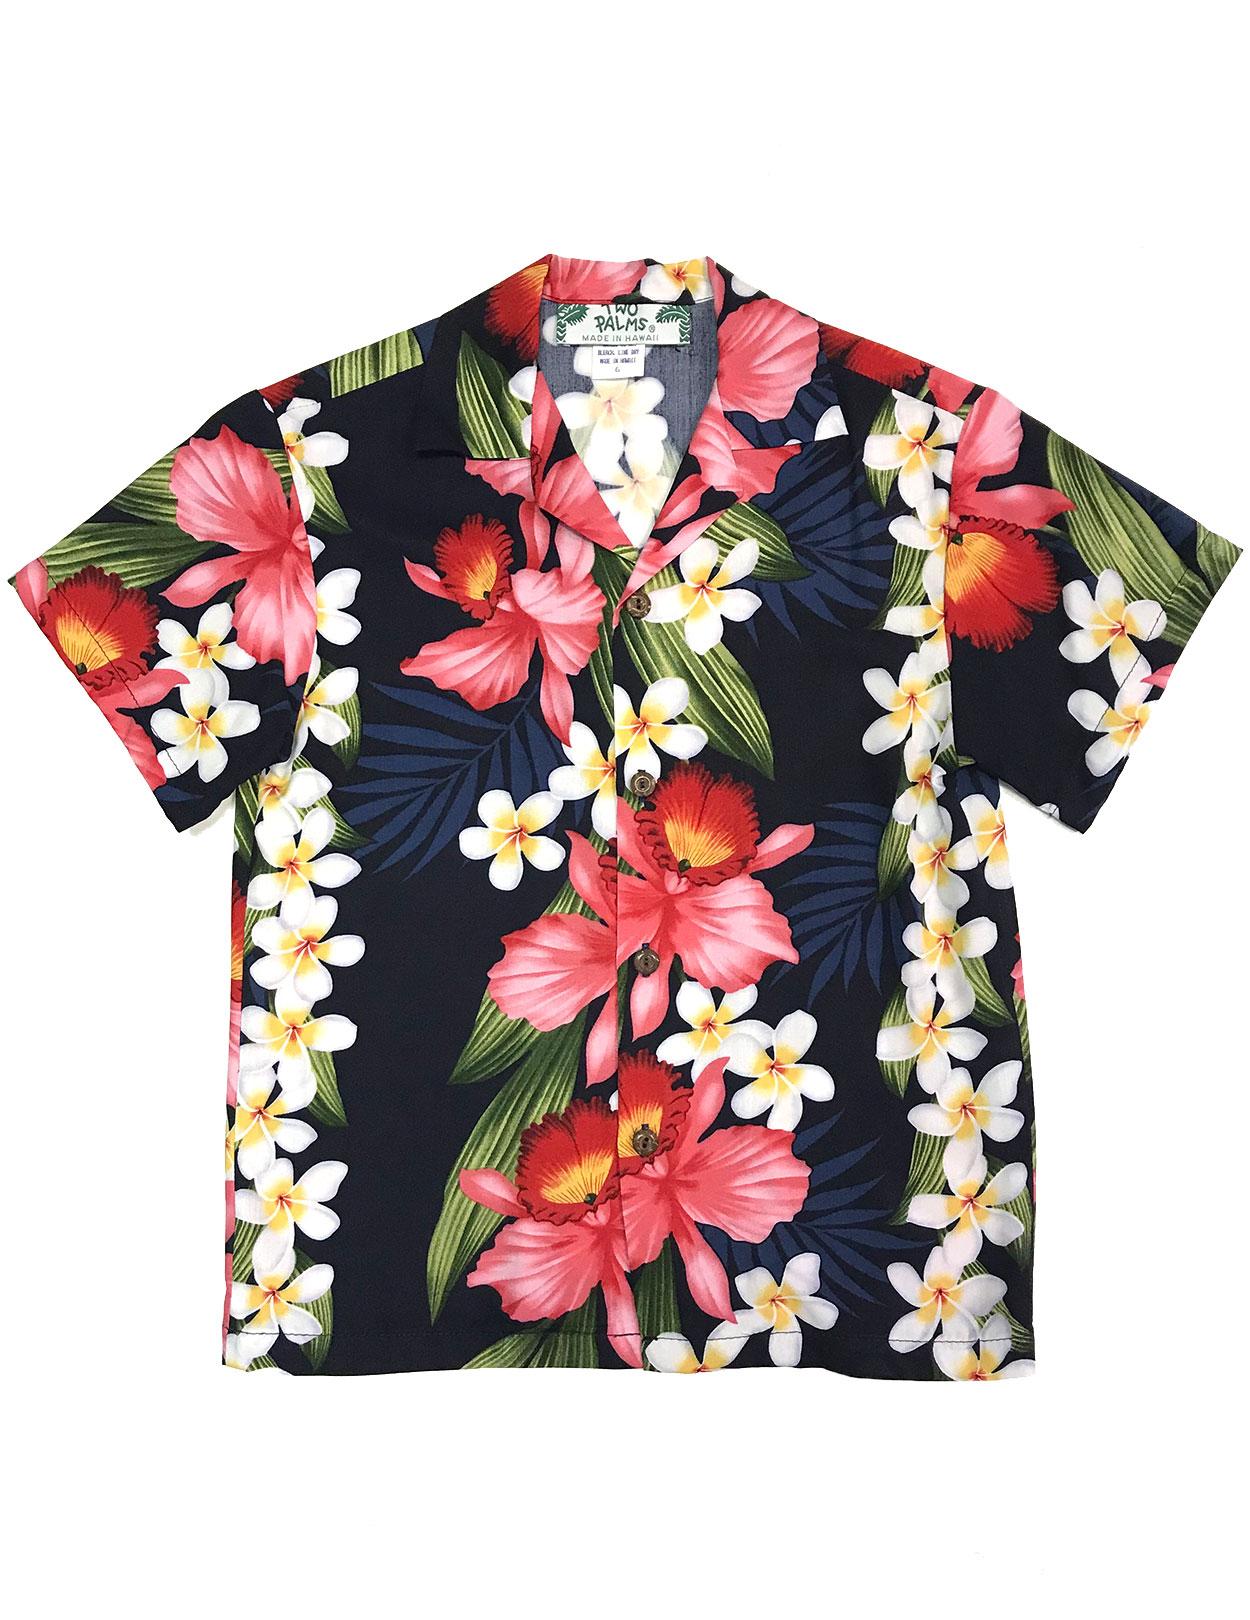 dcb3d820a6d Boys Hawaiian Shirt Plumeria Orchid Panel  Shaka Time Hawaii Clothing Store